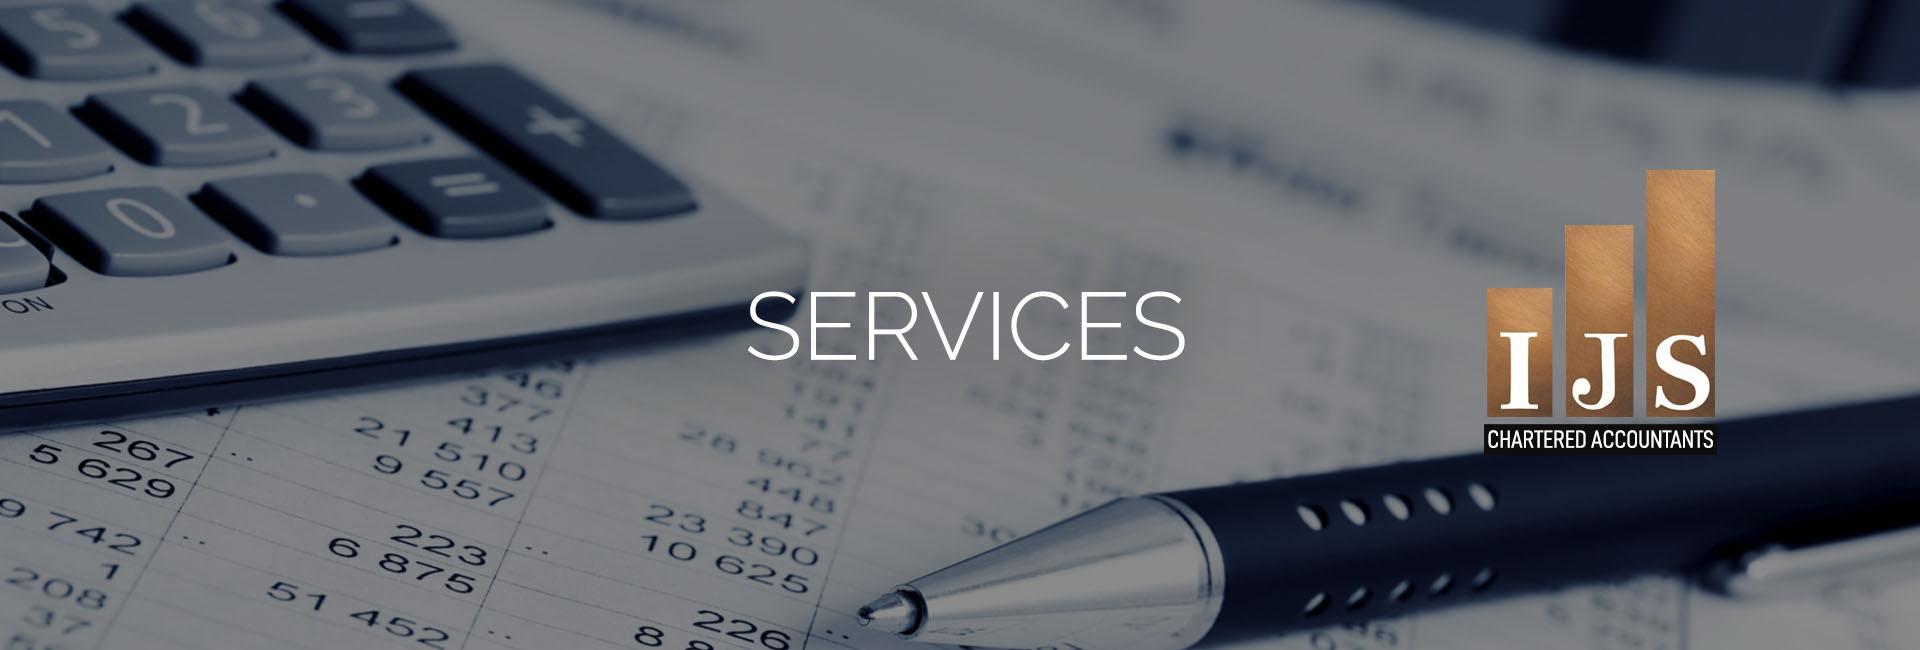 IJS Services